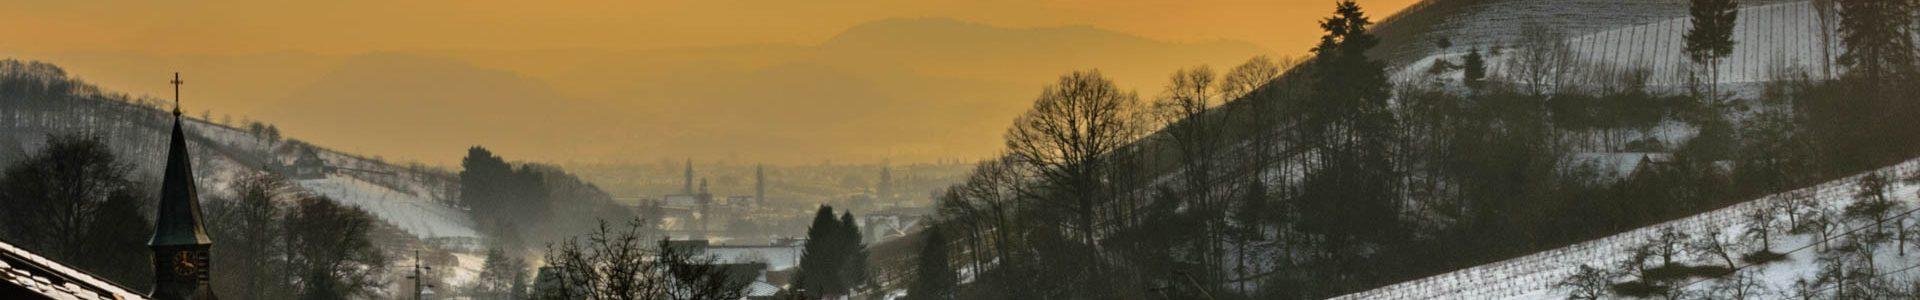 Foto: Abendrot trifft Nebel